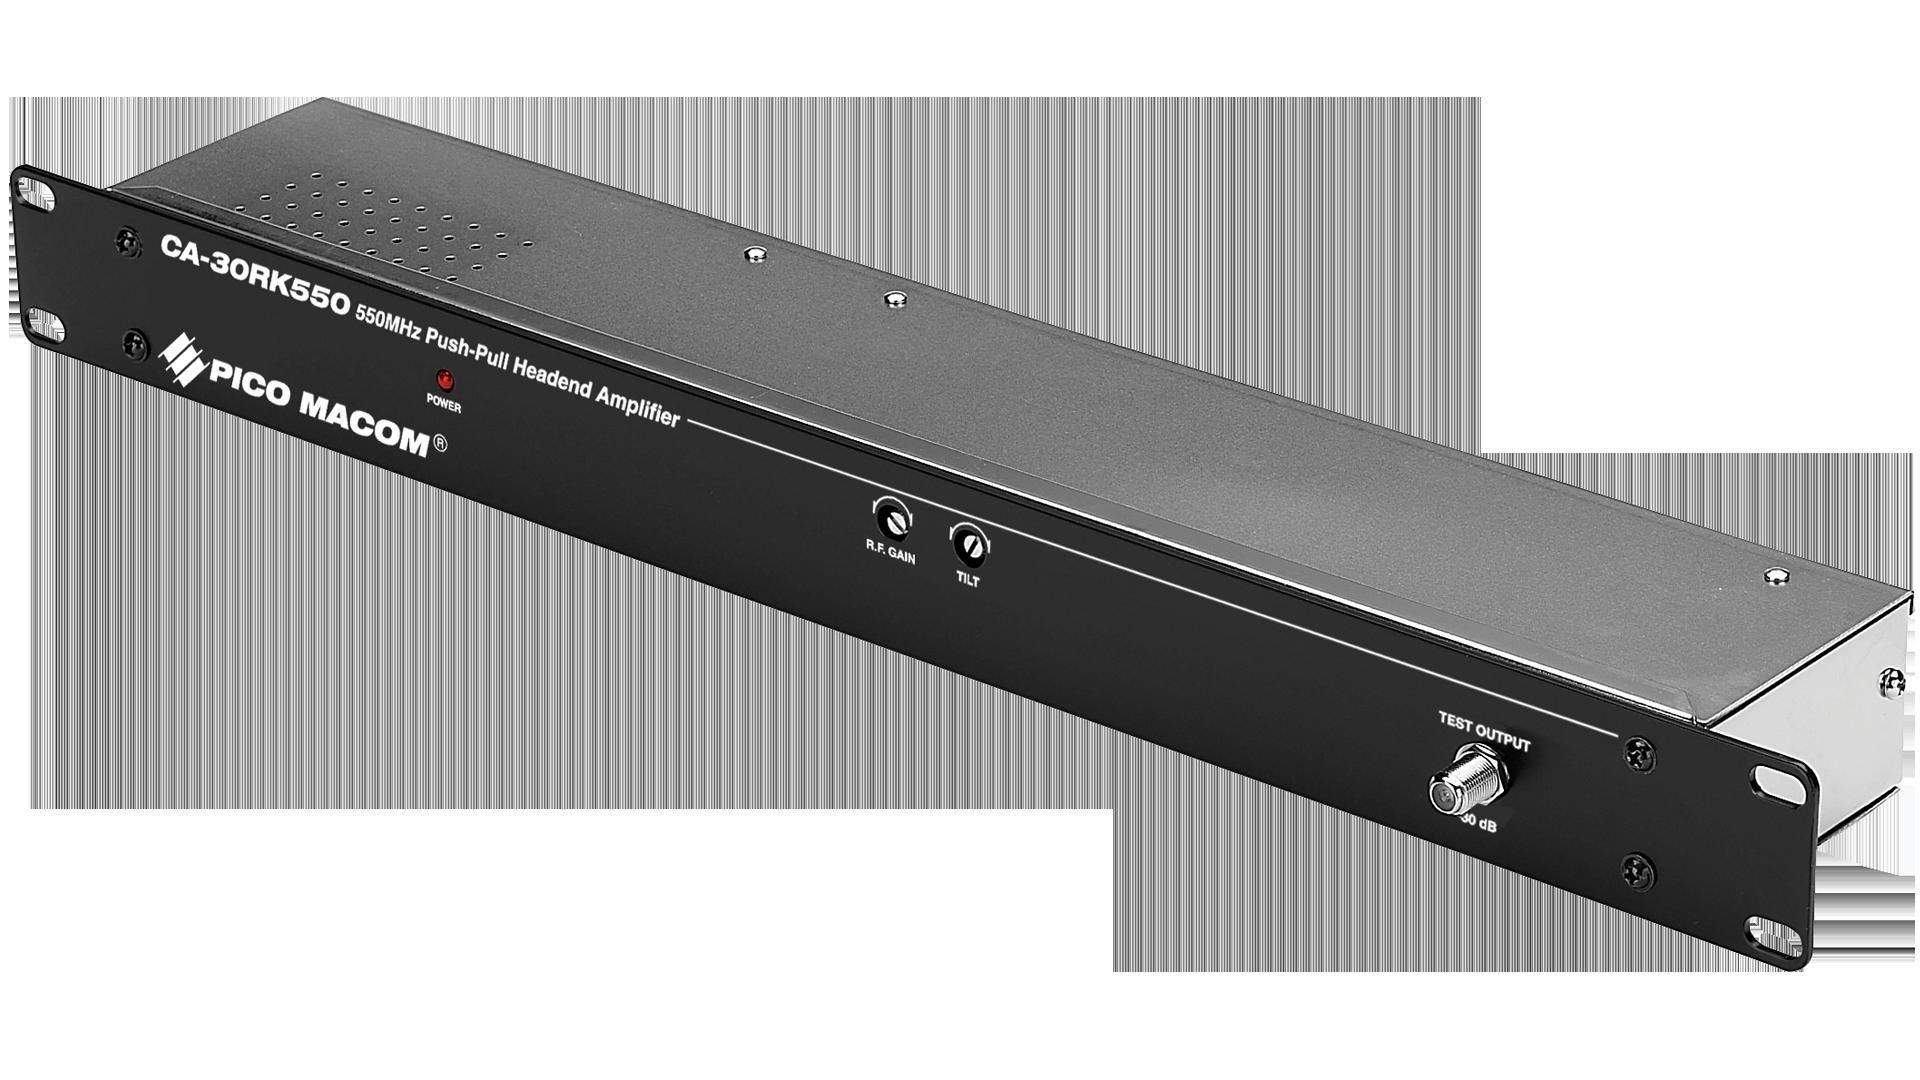 CA-30RK550: 550MHz Push-Pull Headend Amplifier - ATX Networks